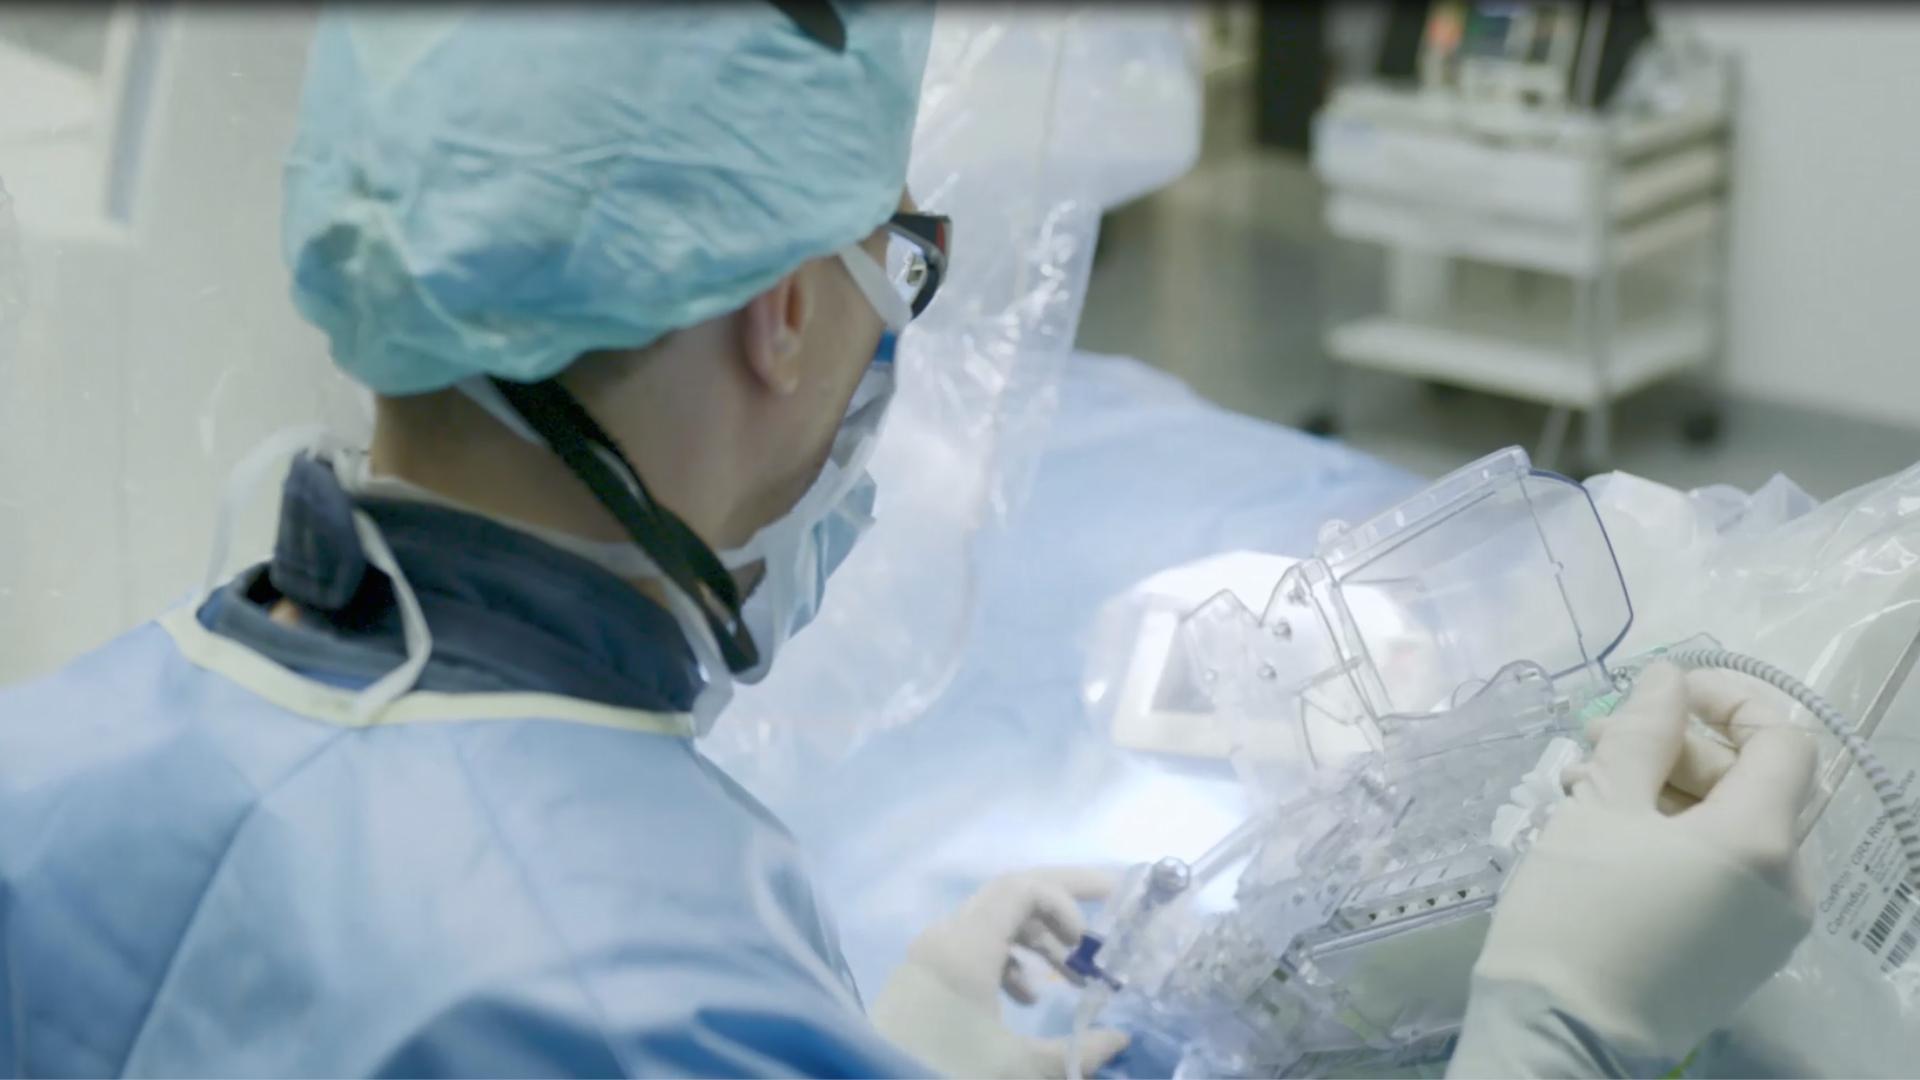 TV footage – University Hospital Giessen